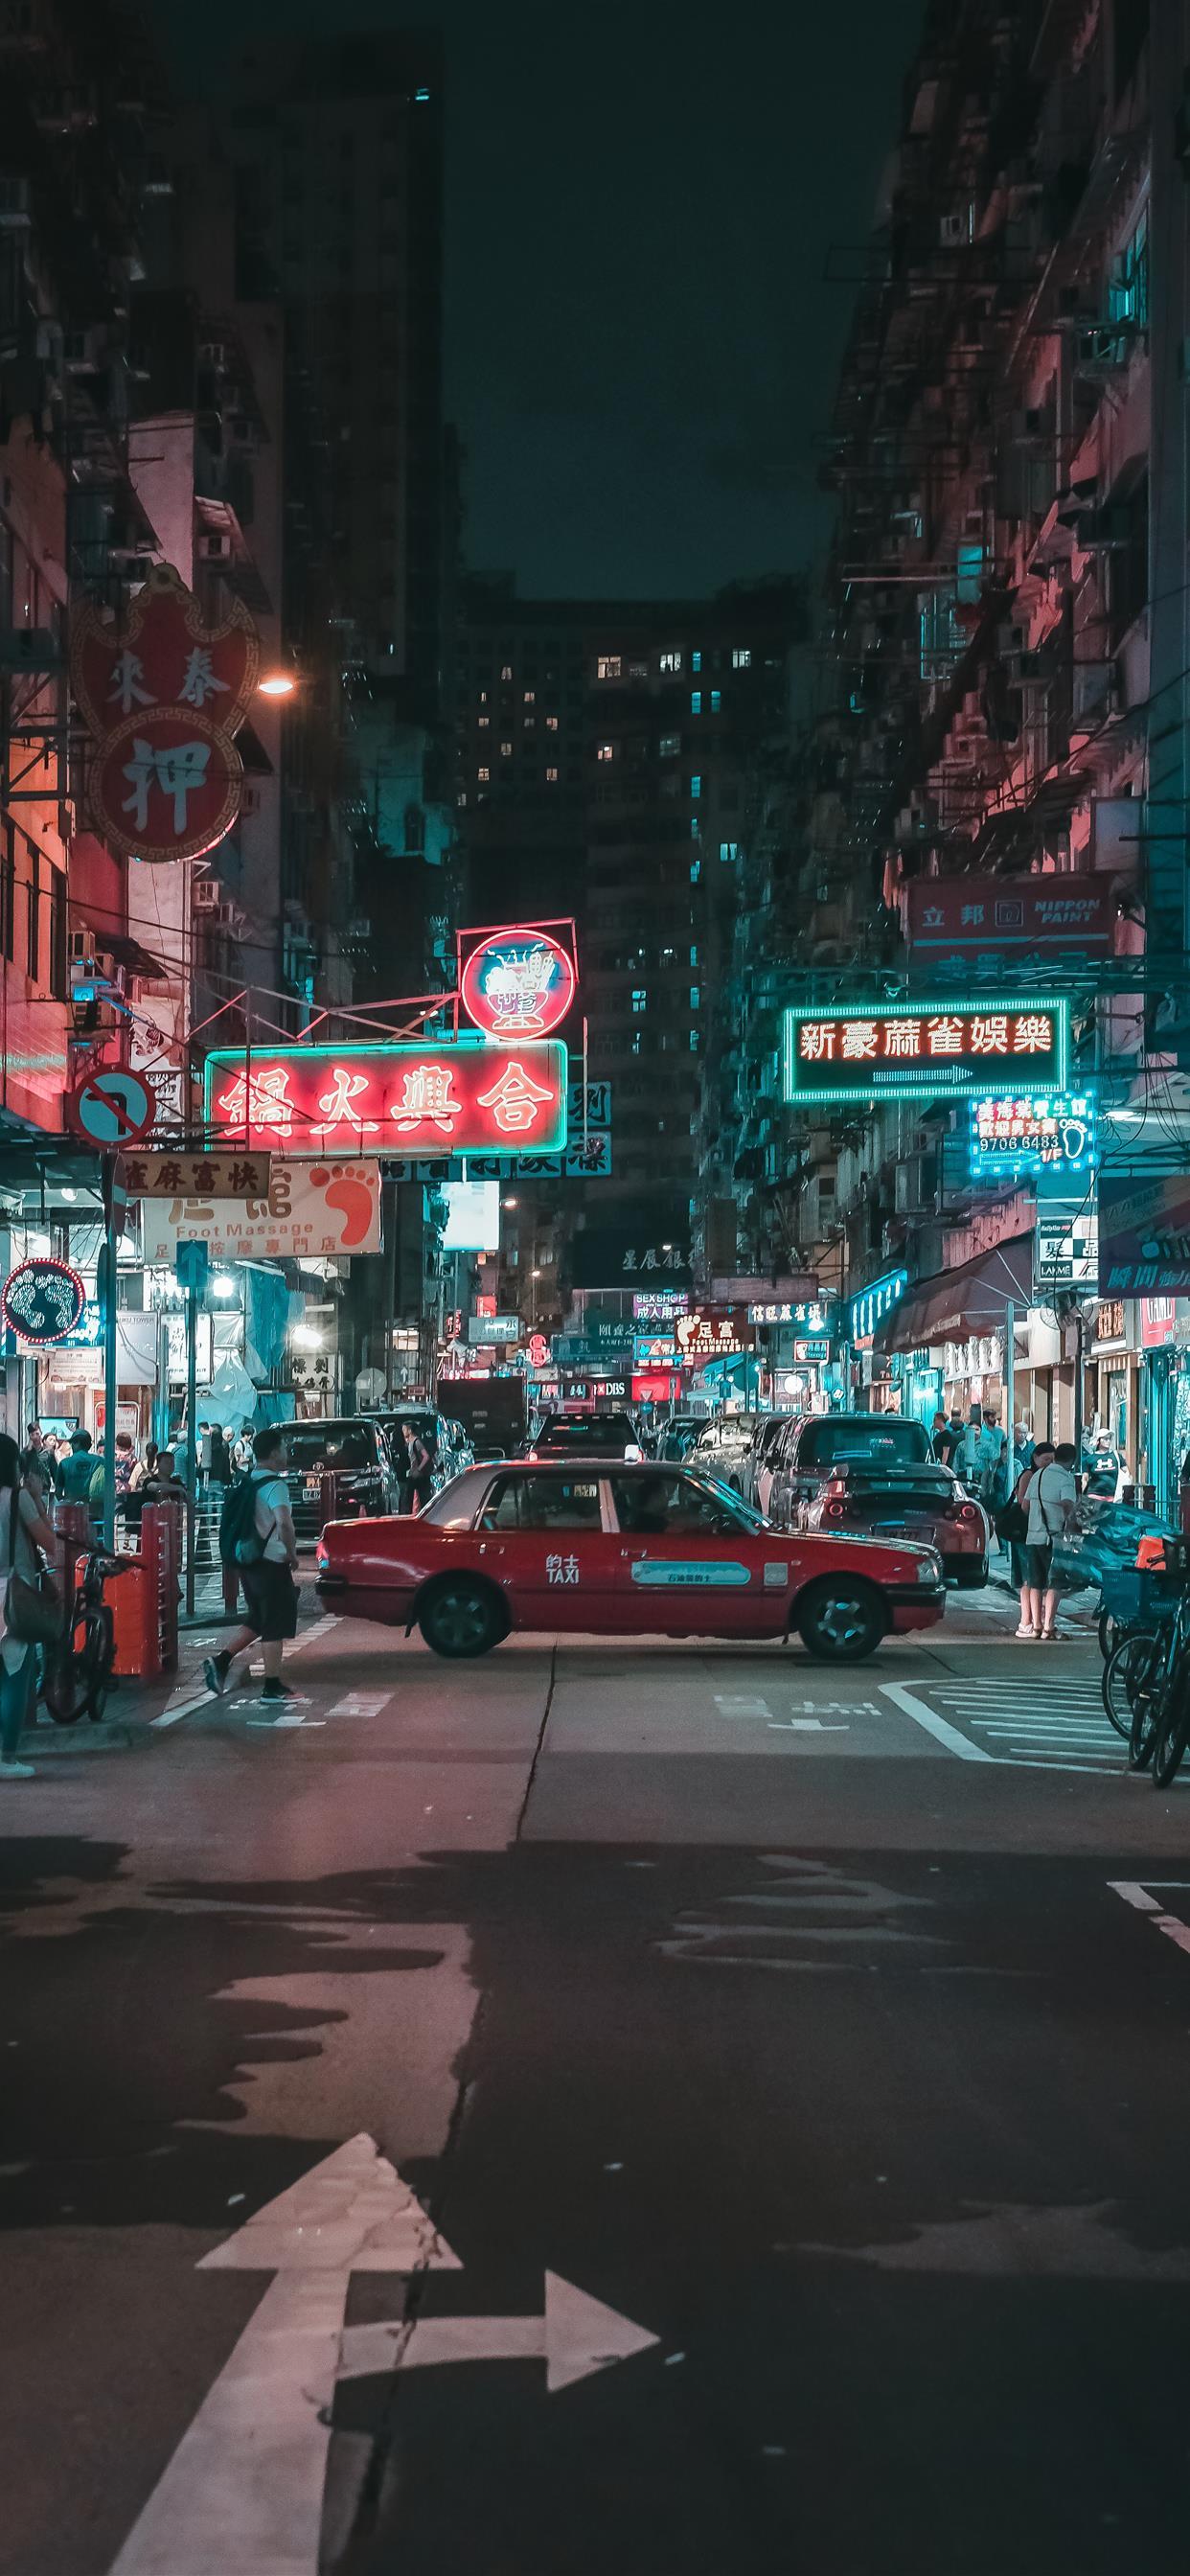 Yau Ma Tei Kowloon Hong Kong Iphone Wallpapers Free Download